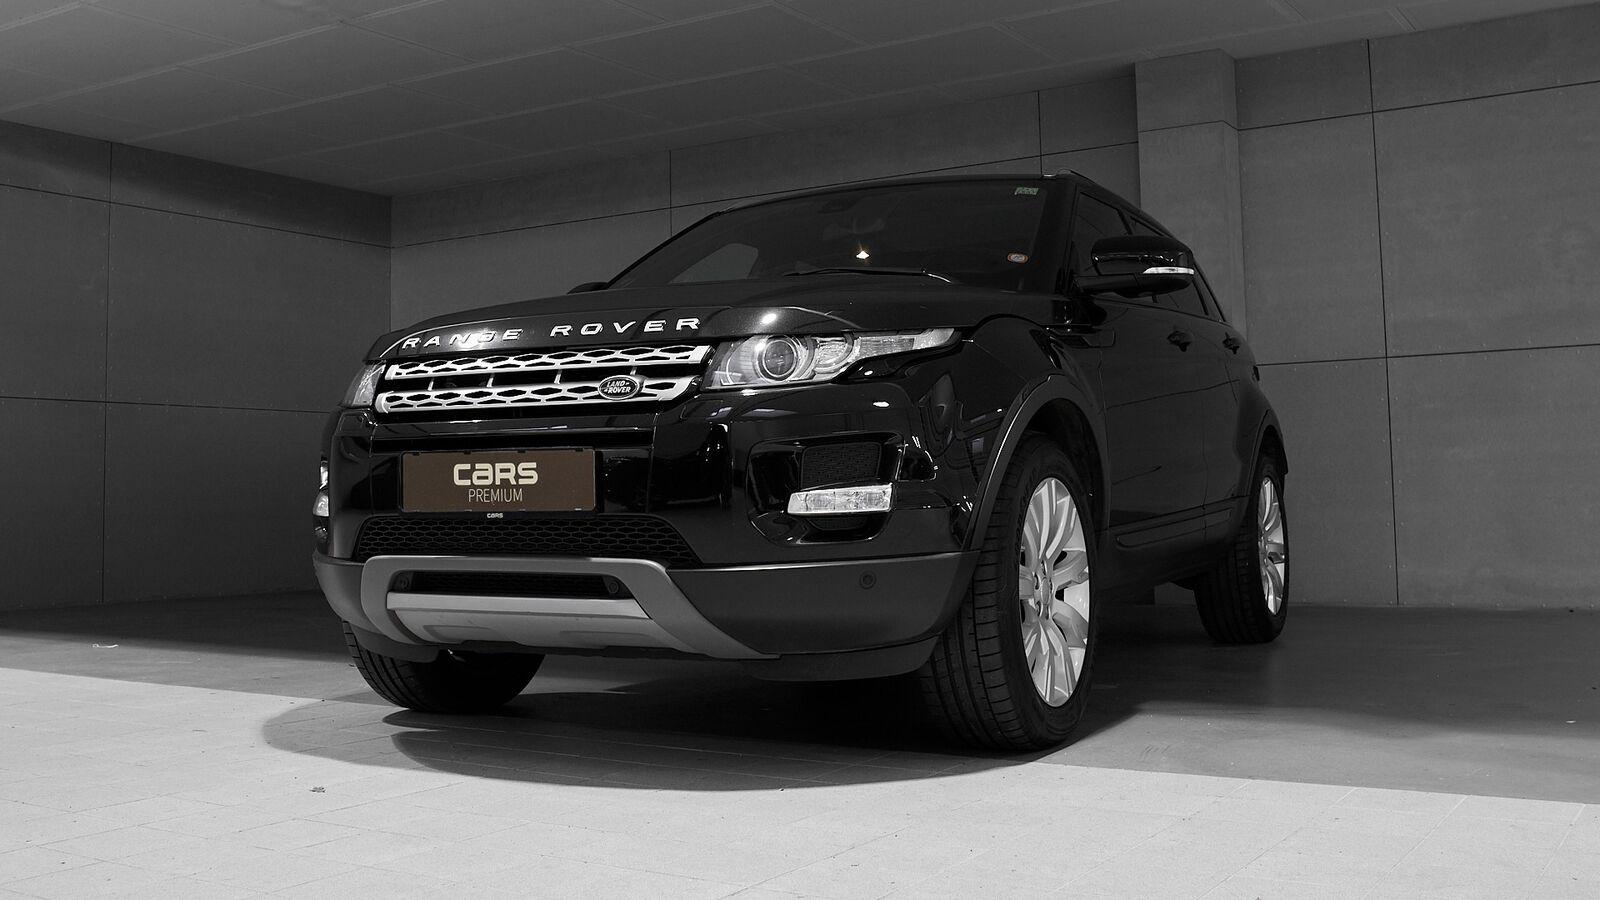 Land Rover Range Rover Evoque 2,2 SD4 Dynamic aut. 5d - 2.568 kr.